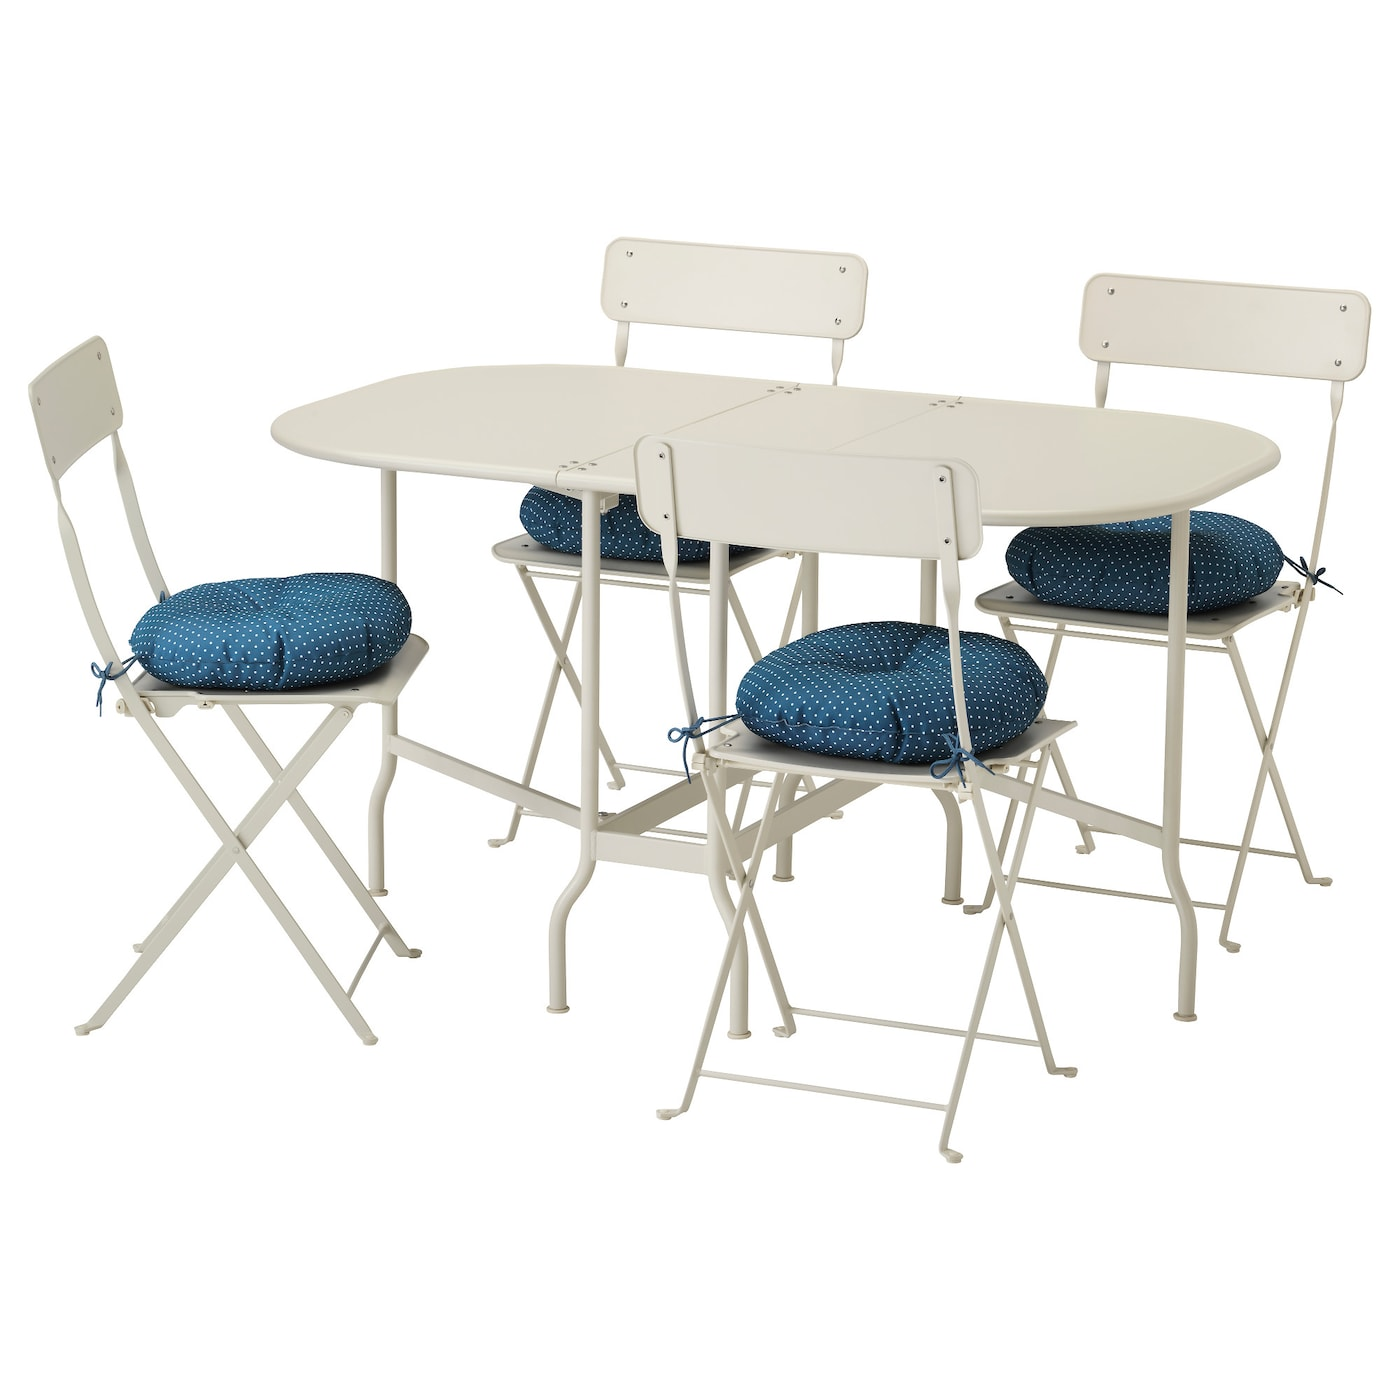 tables de jardin design pas cher ikea. Black Bedroom Furniture Sets. Home Design Ideas